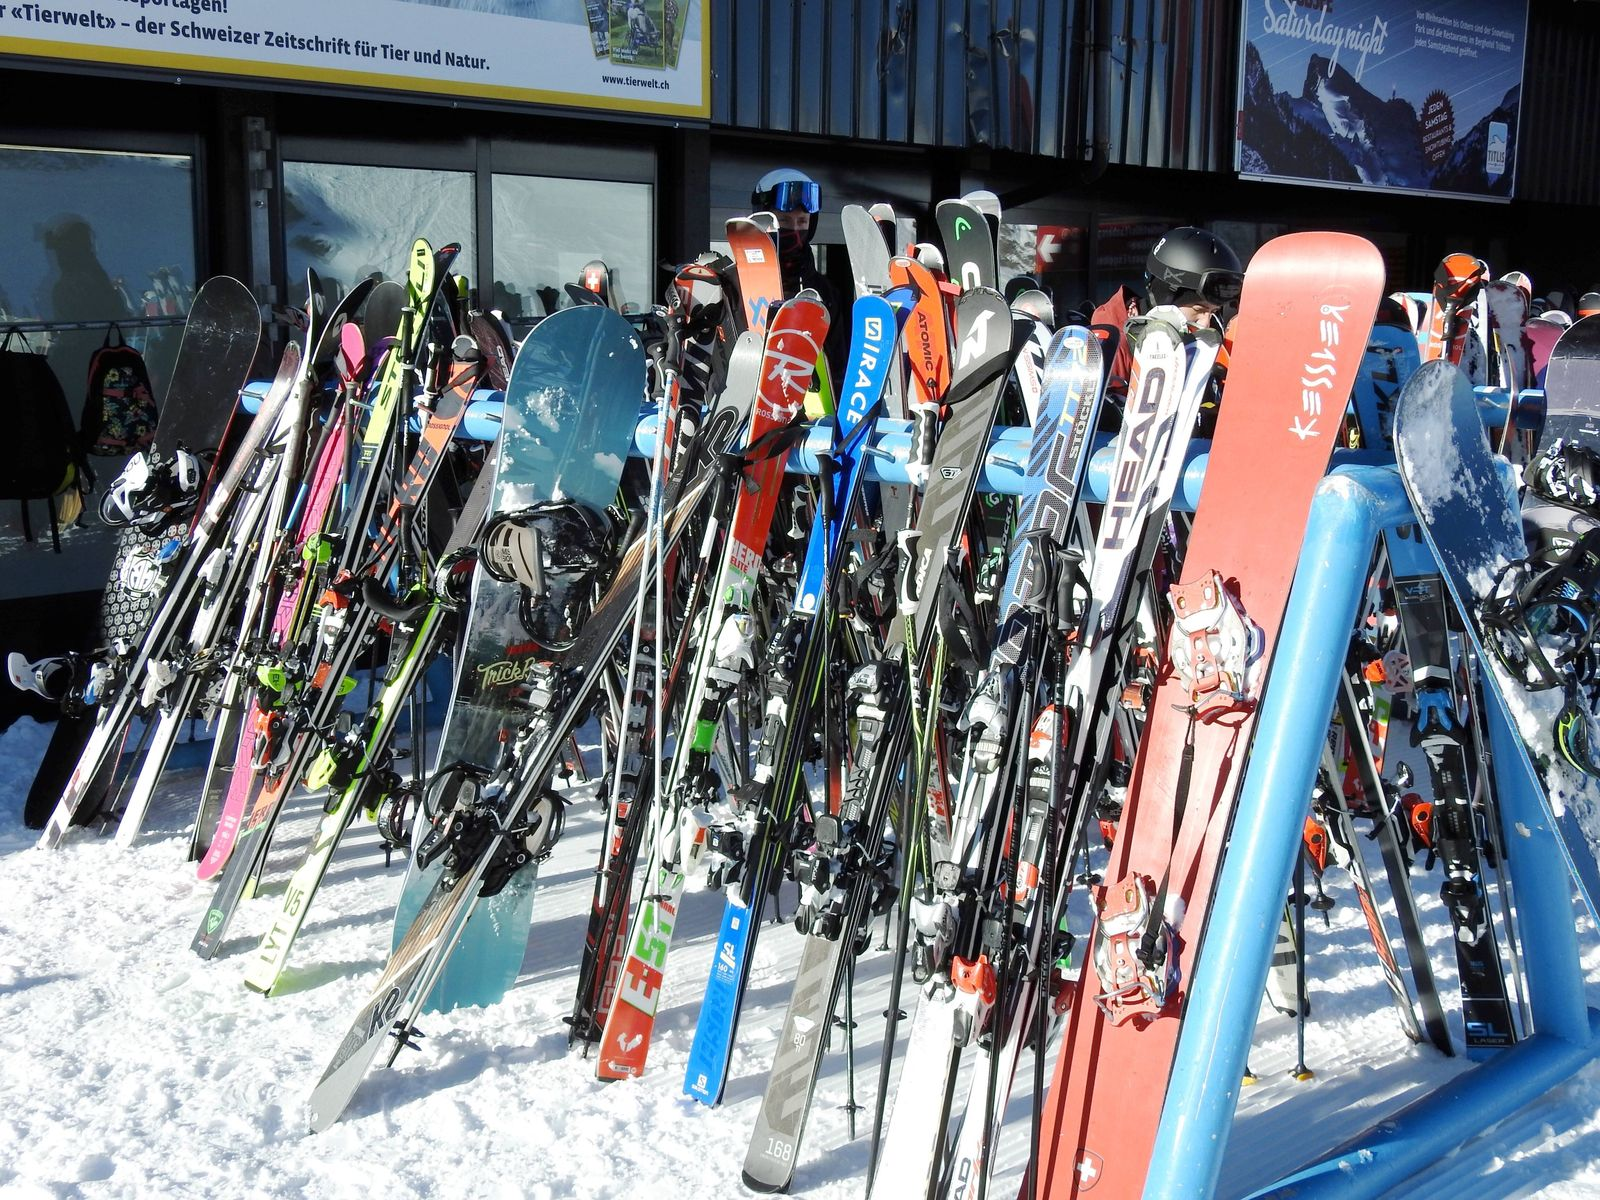 Foto Manuel Geisser 10.12.2020 Wintertourismus Schweiz Tourismus. Corona Covit-19 Corona-Krise.Bild : Titlis , Viele Ski